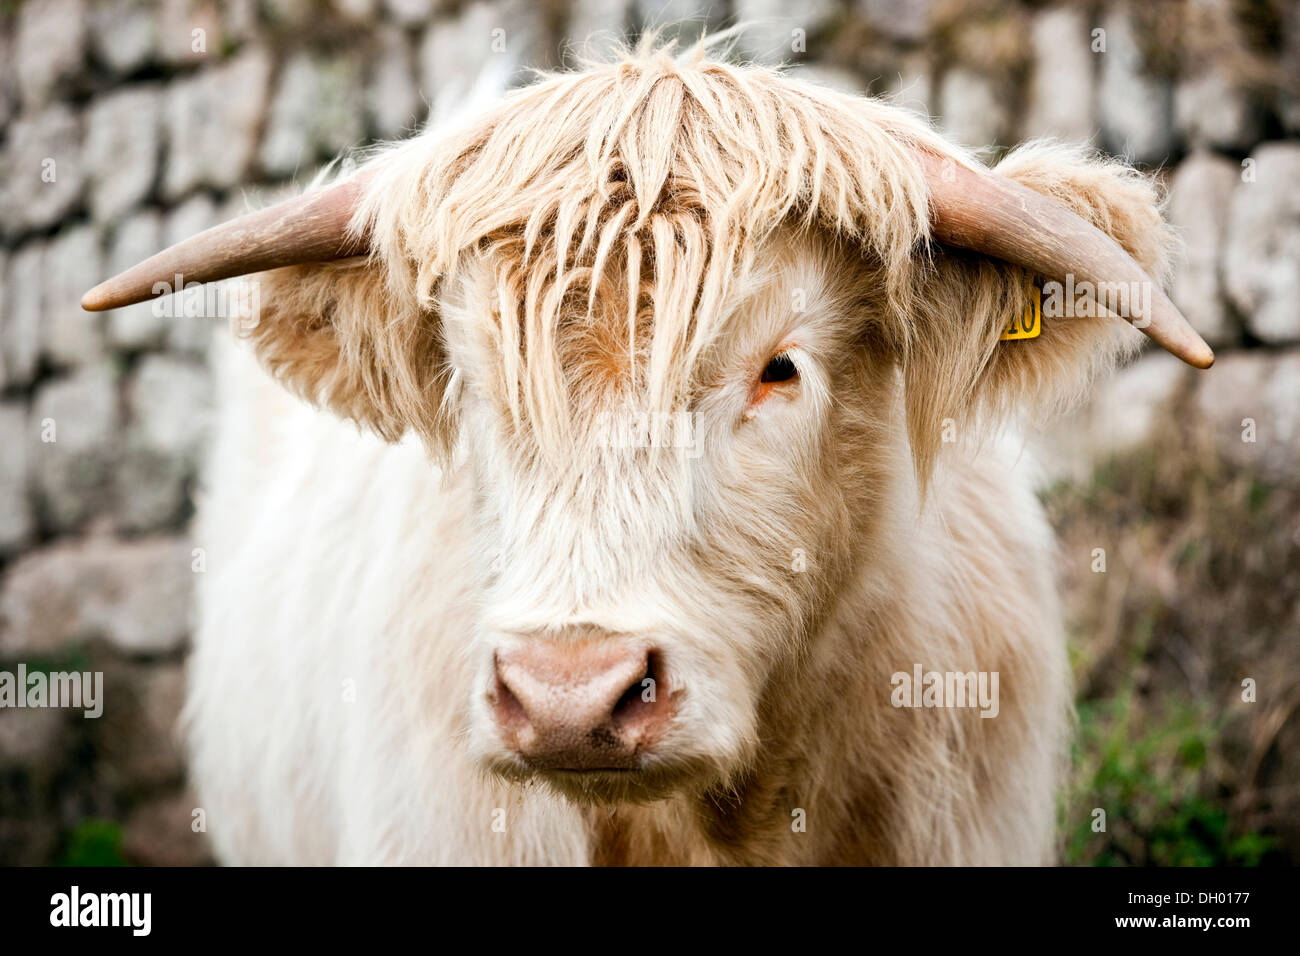 Scottish Highland cattle, jeune taureau, race mixte, Cornwall, Angleterre, Royaume-Uni Banque D'Images